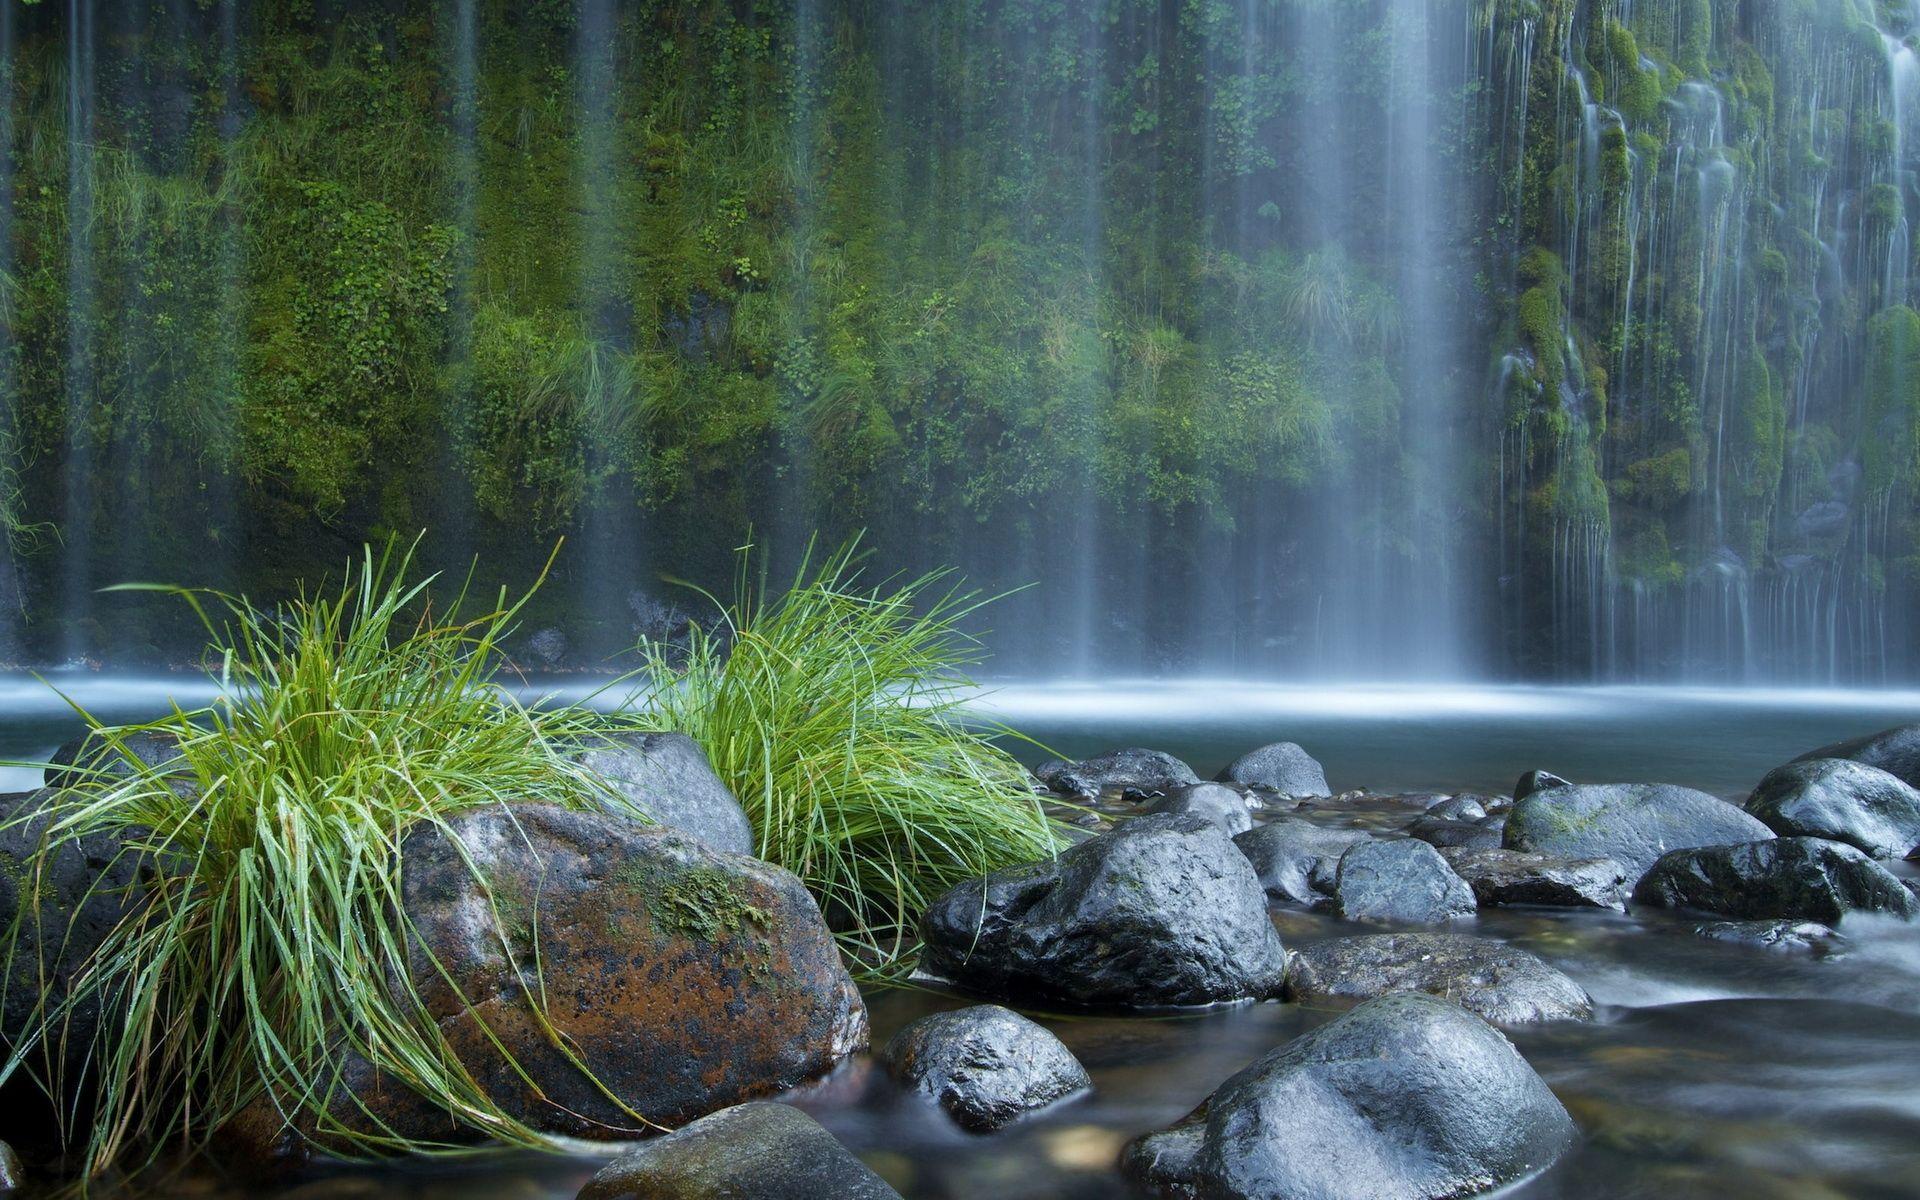 Nature Wallpaper By Junaid Waterfall Wallpaper Waterfall Landscape Waterfall